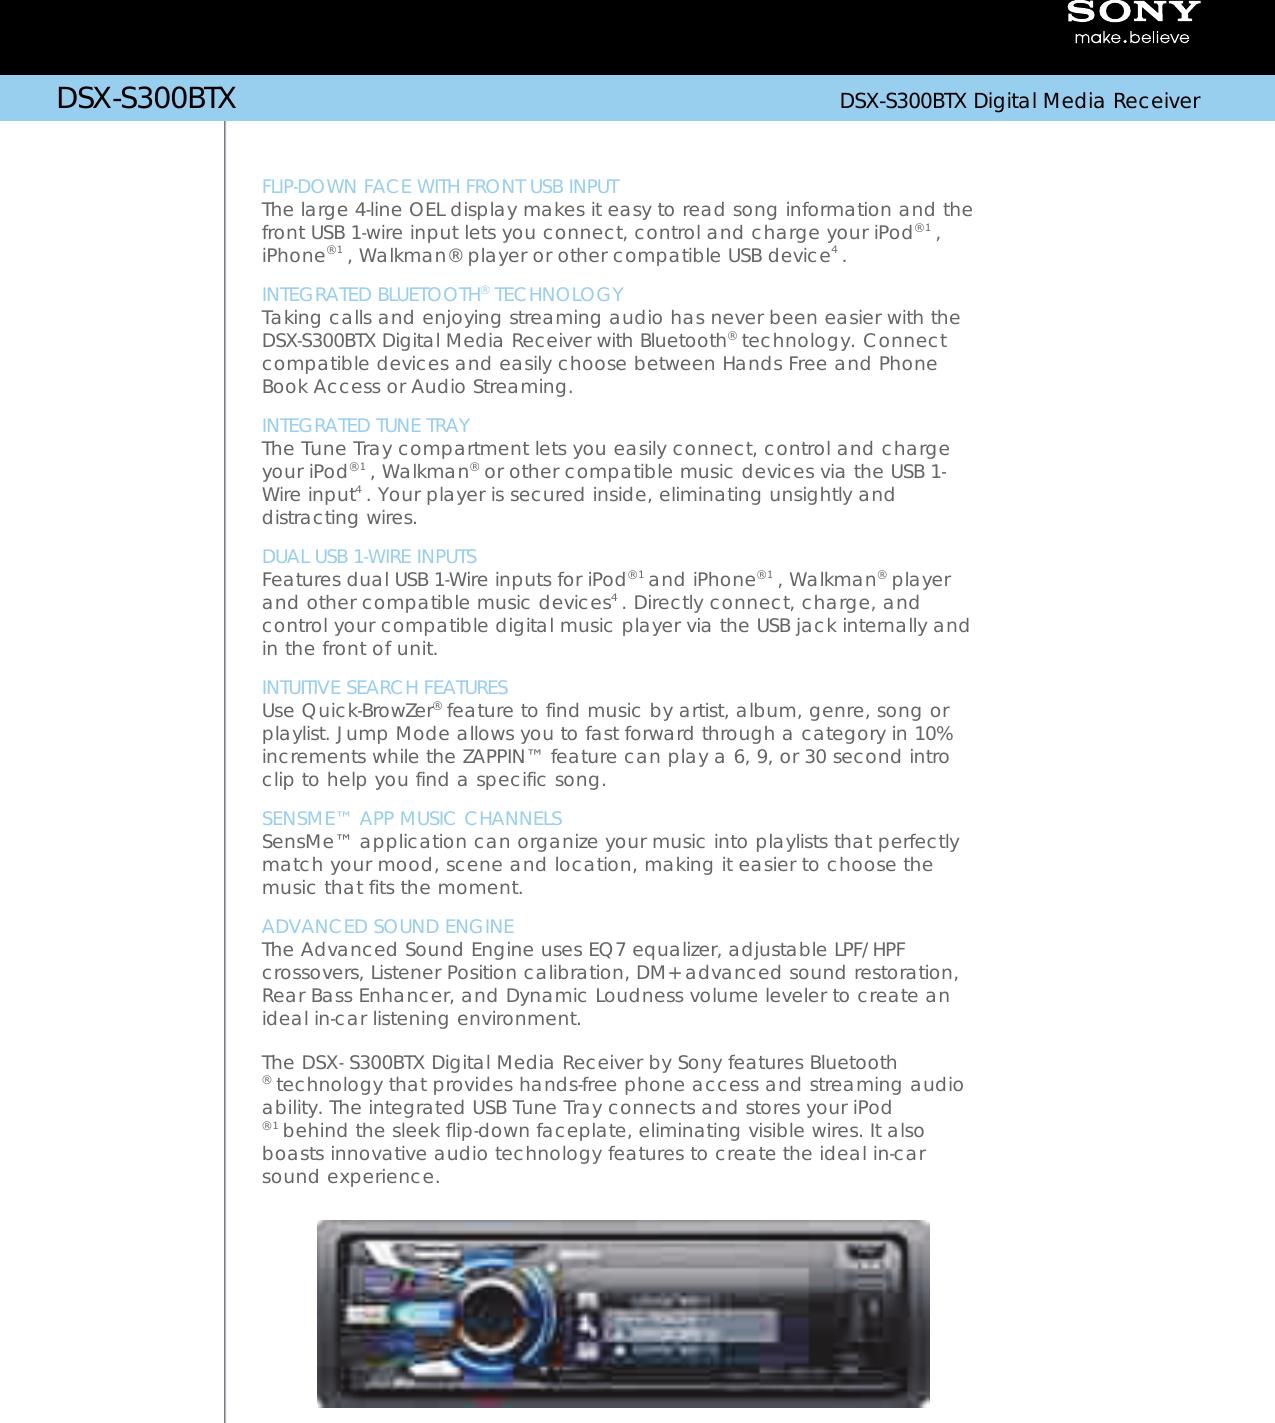 Sony DSX-S300BTX DSXS300BTX S300BTX Bluetooth Micrófono Radio DSX